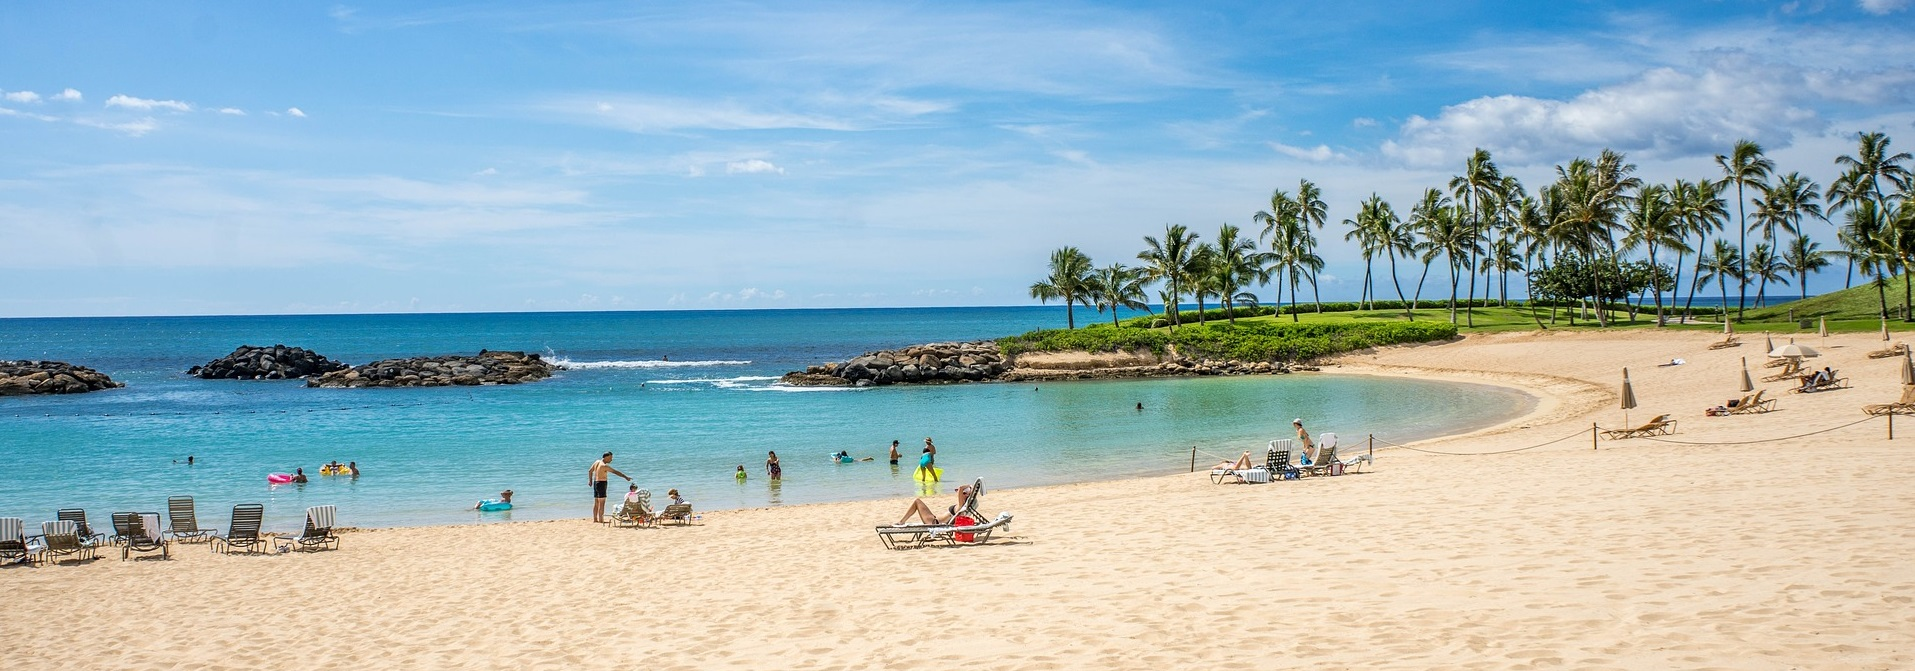 США Гаваї Оаху